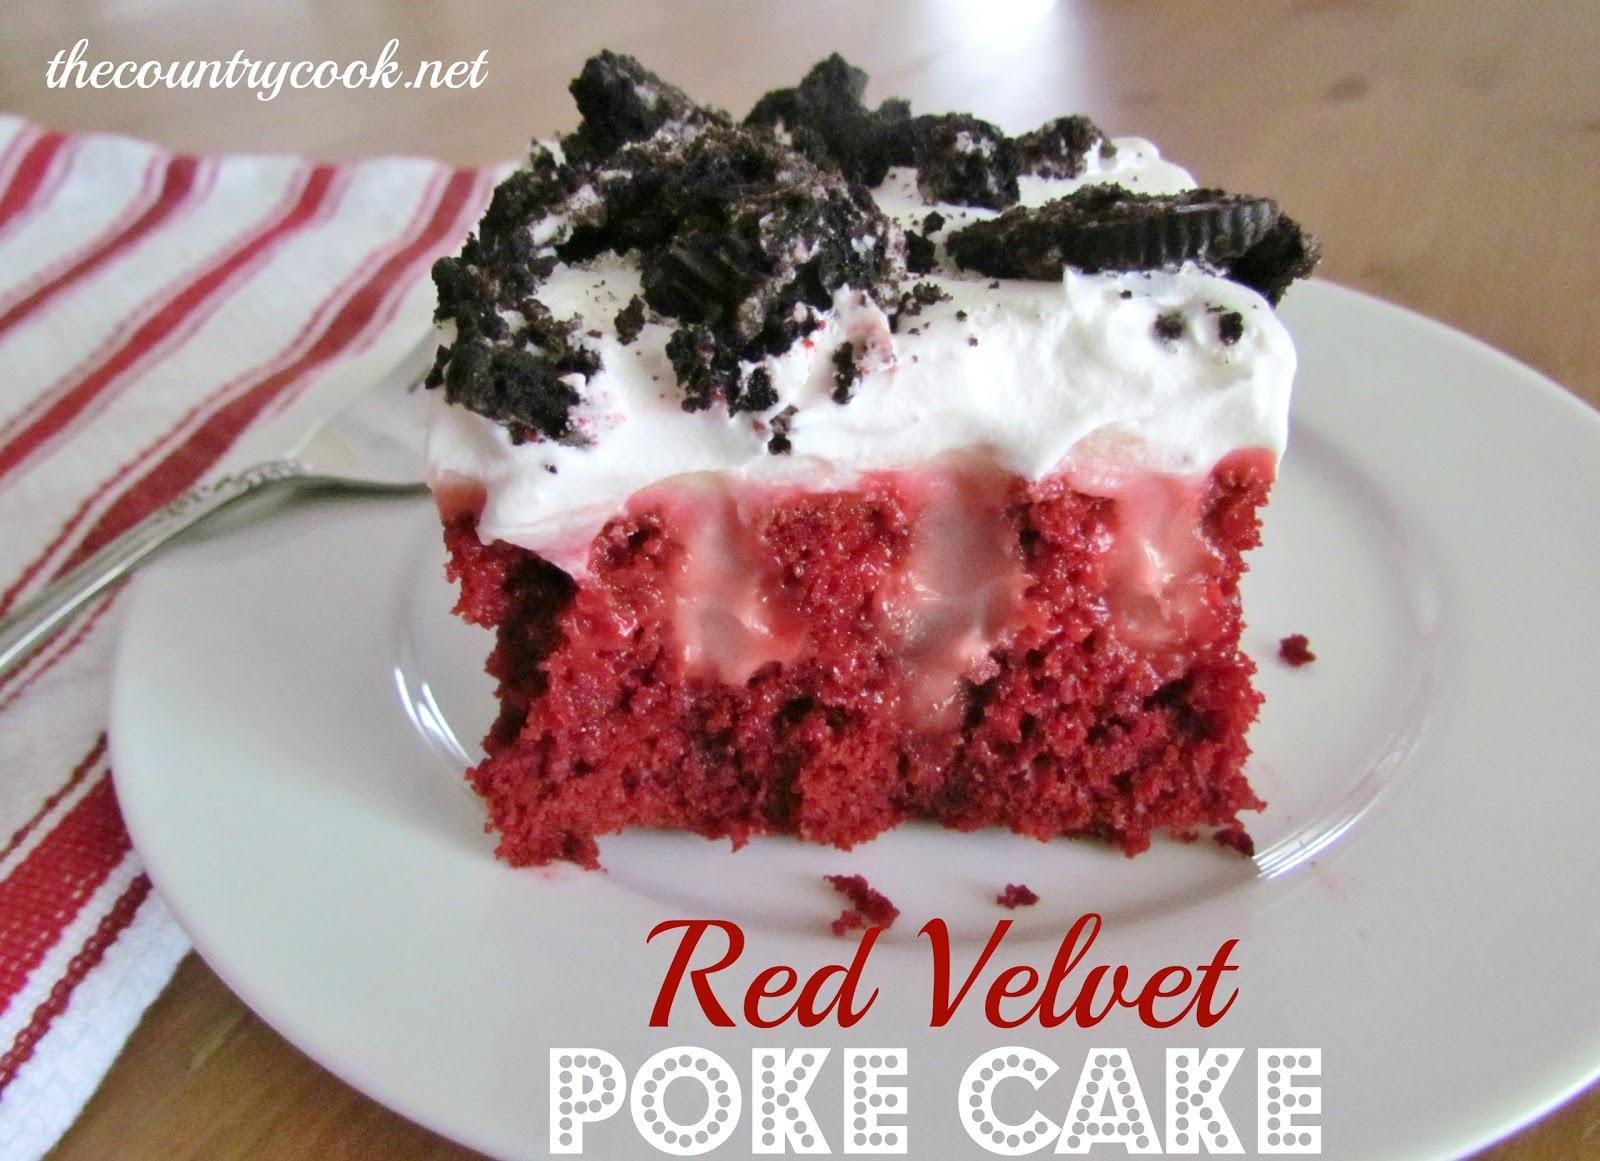 Use Yellow Cake Mix To Make Red Velvet Cake